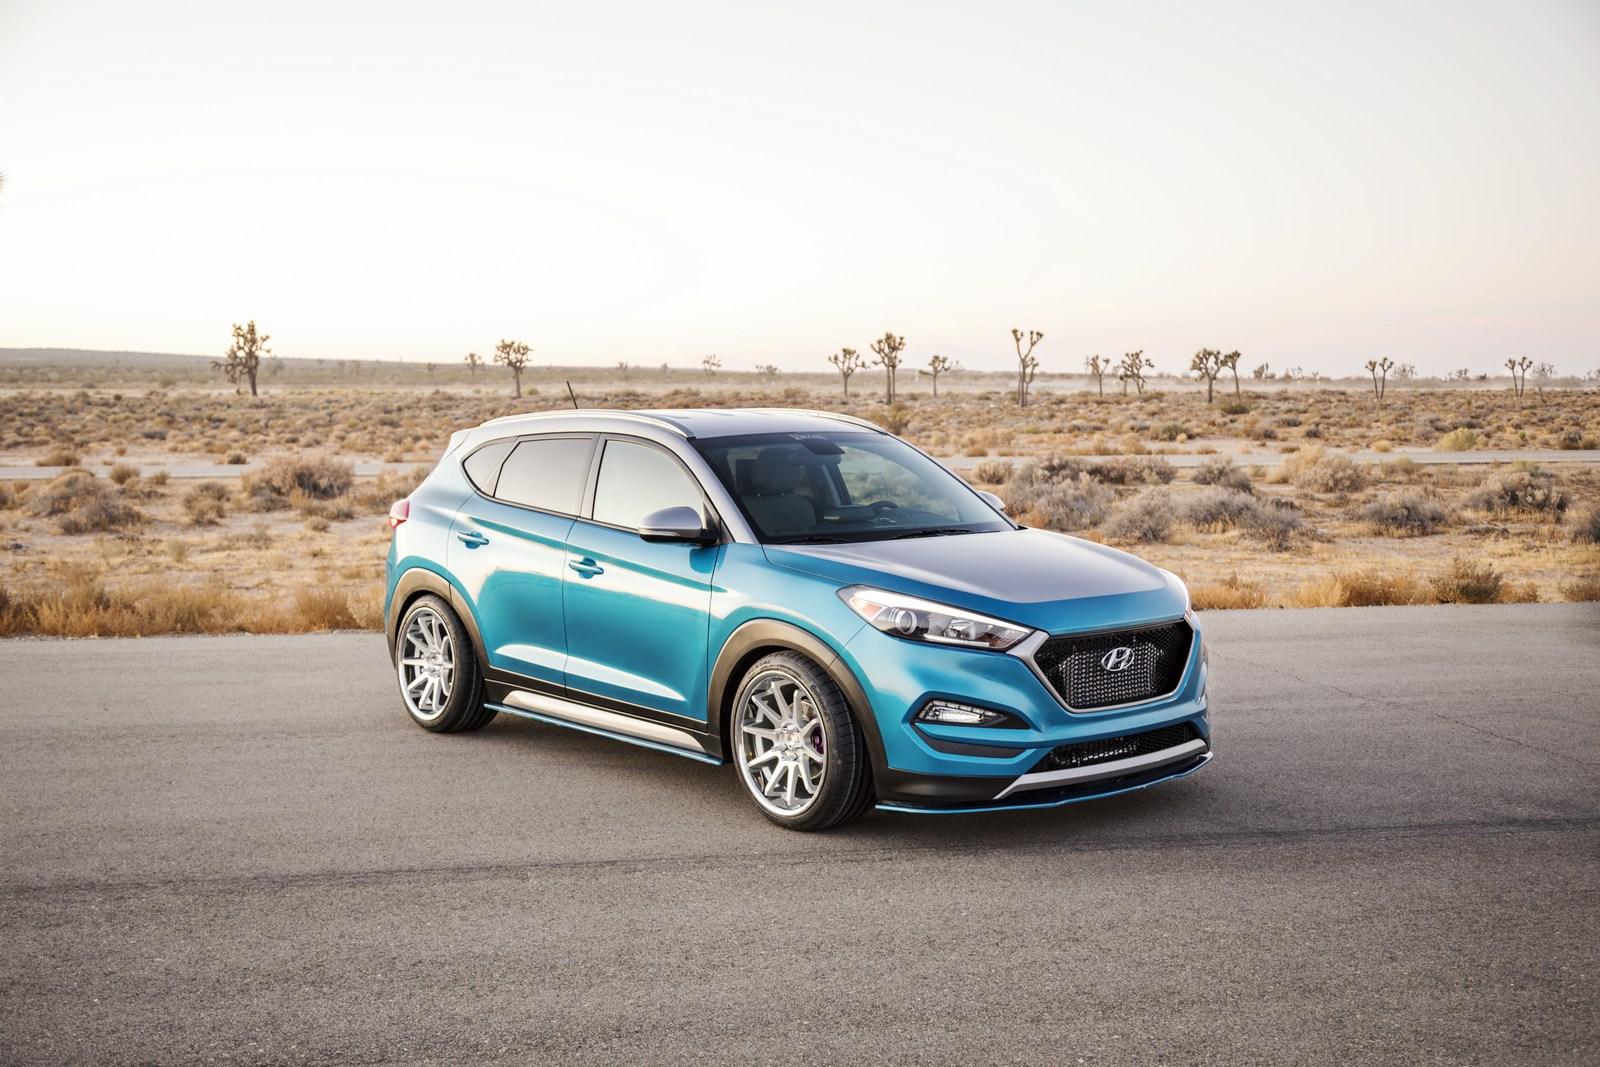 Hyundai-Vaccar-Tucson-Sport-Concept-1